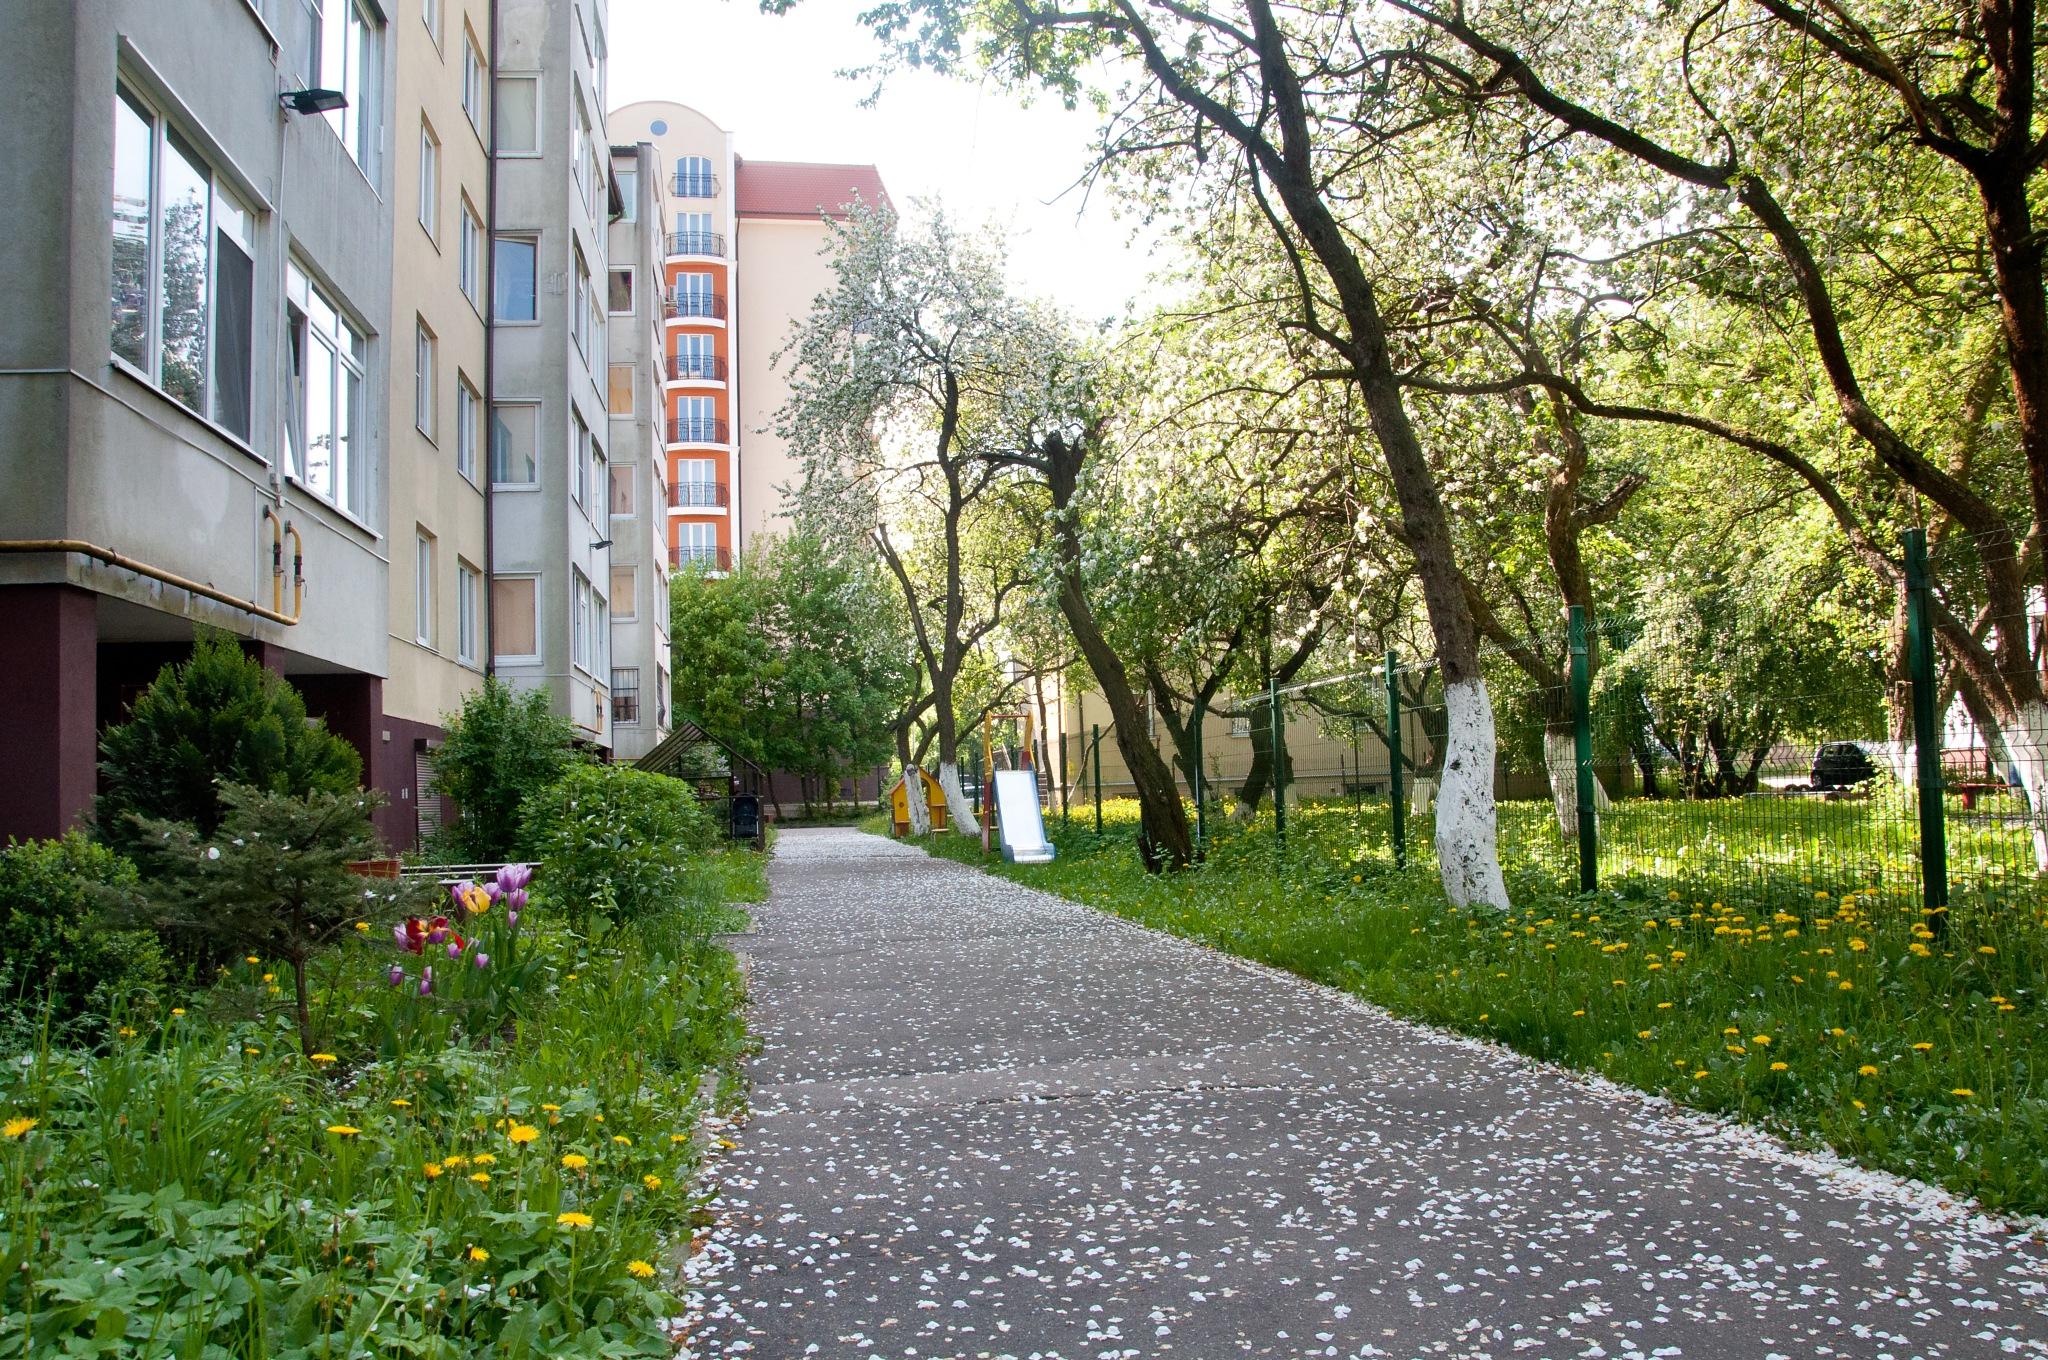 Courtyard in Kaliningrad by Anna Pronenko